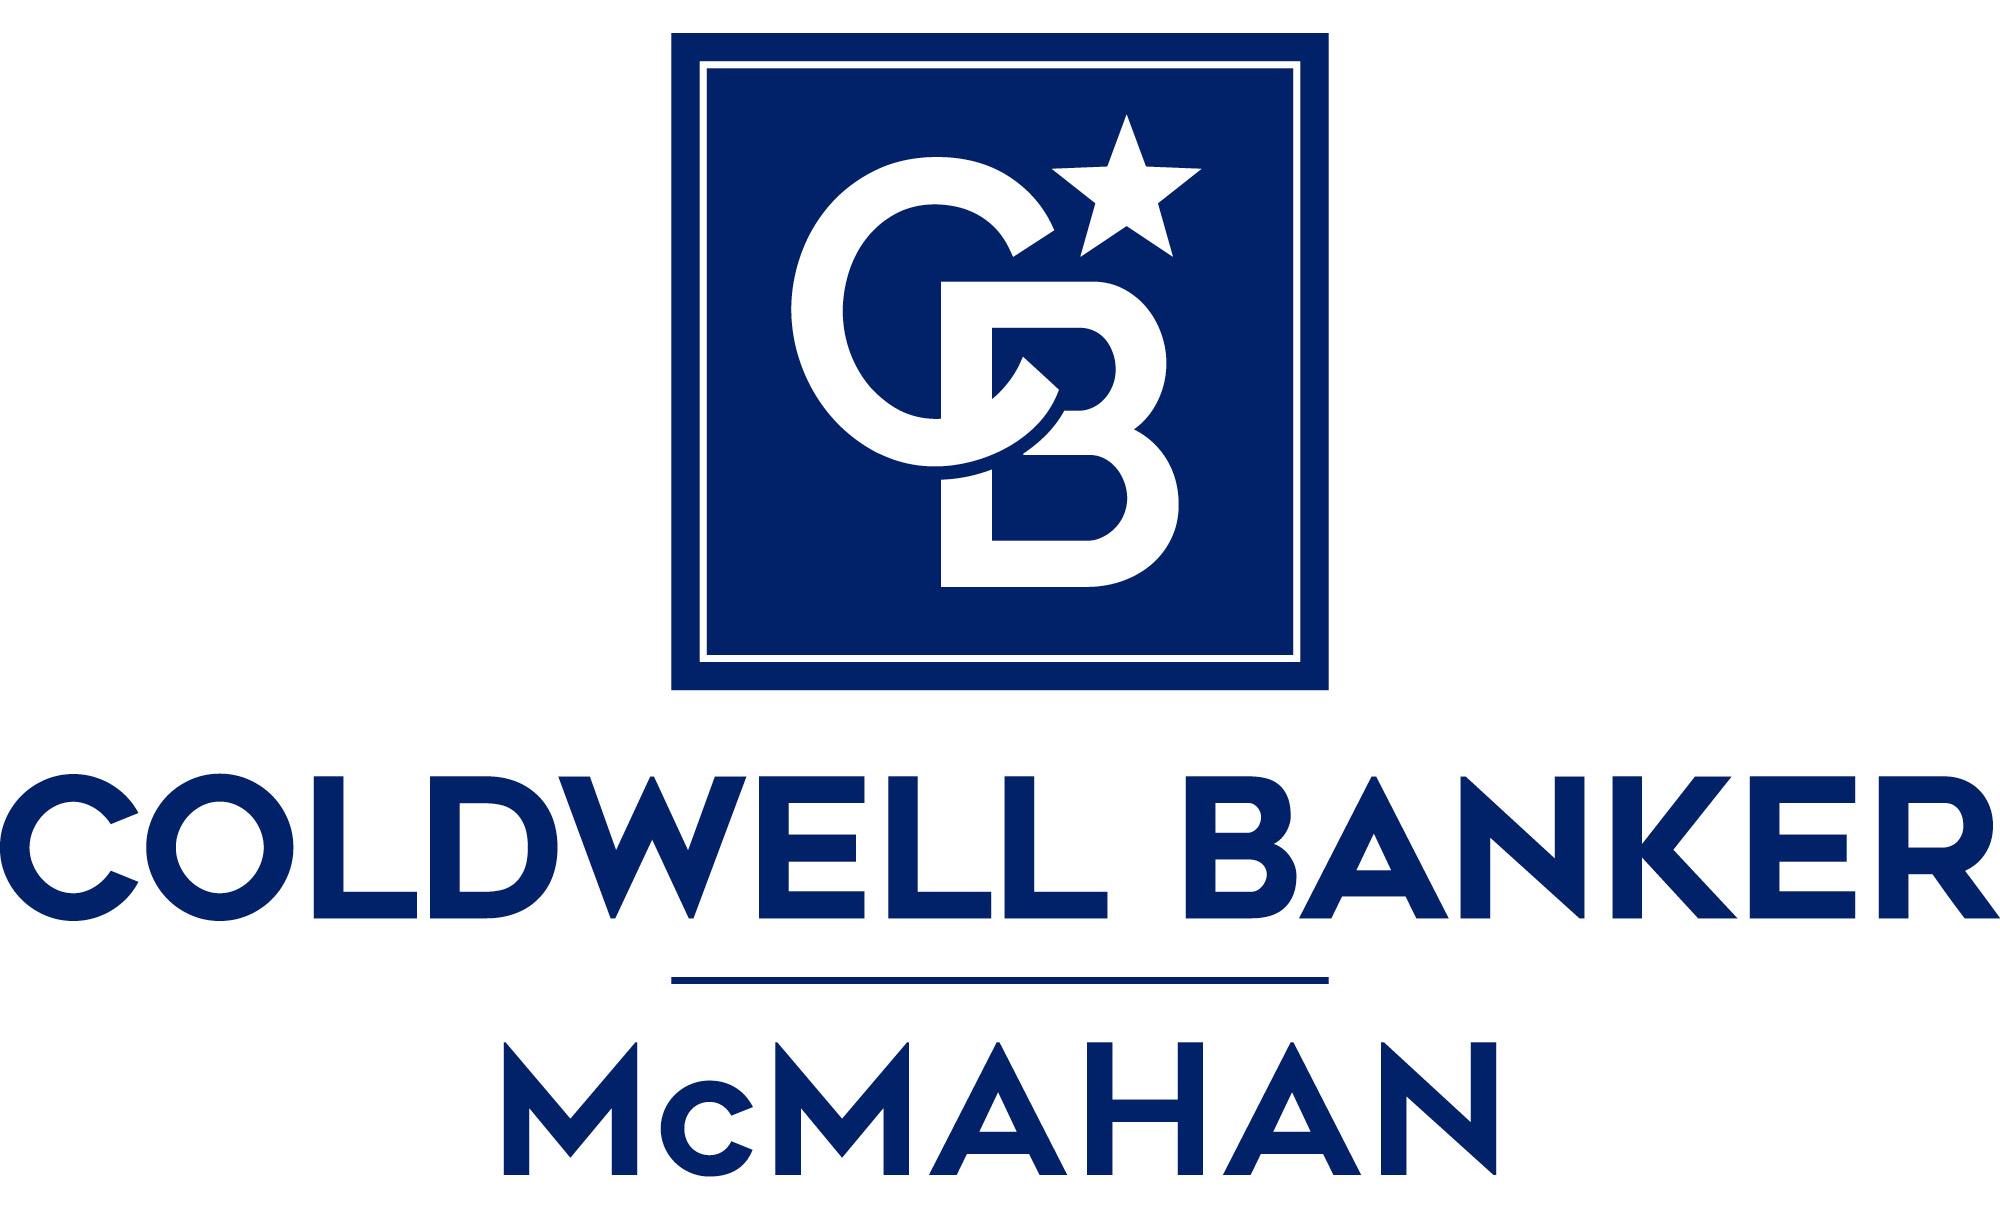 Keith Boley - Coldwell Banker McMahan Logo